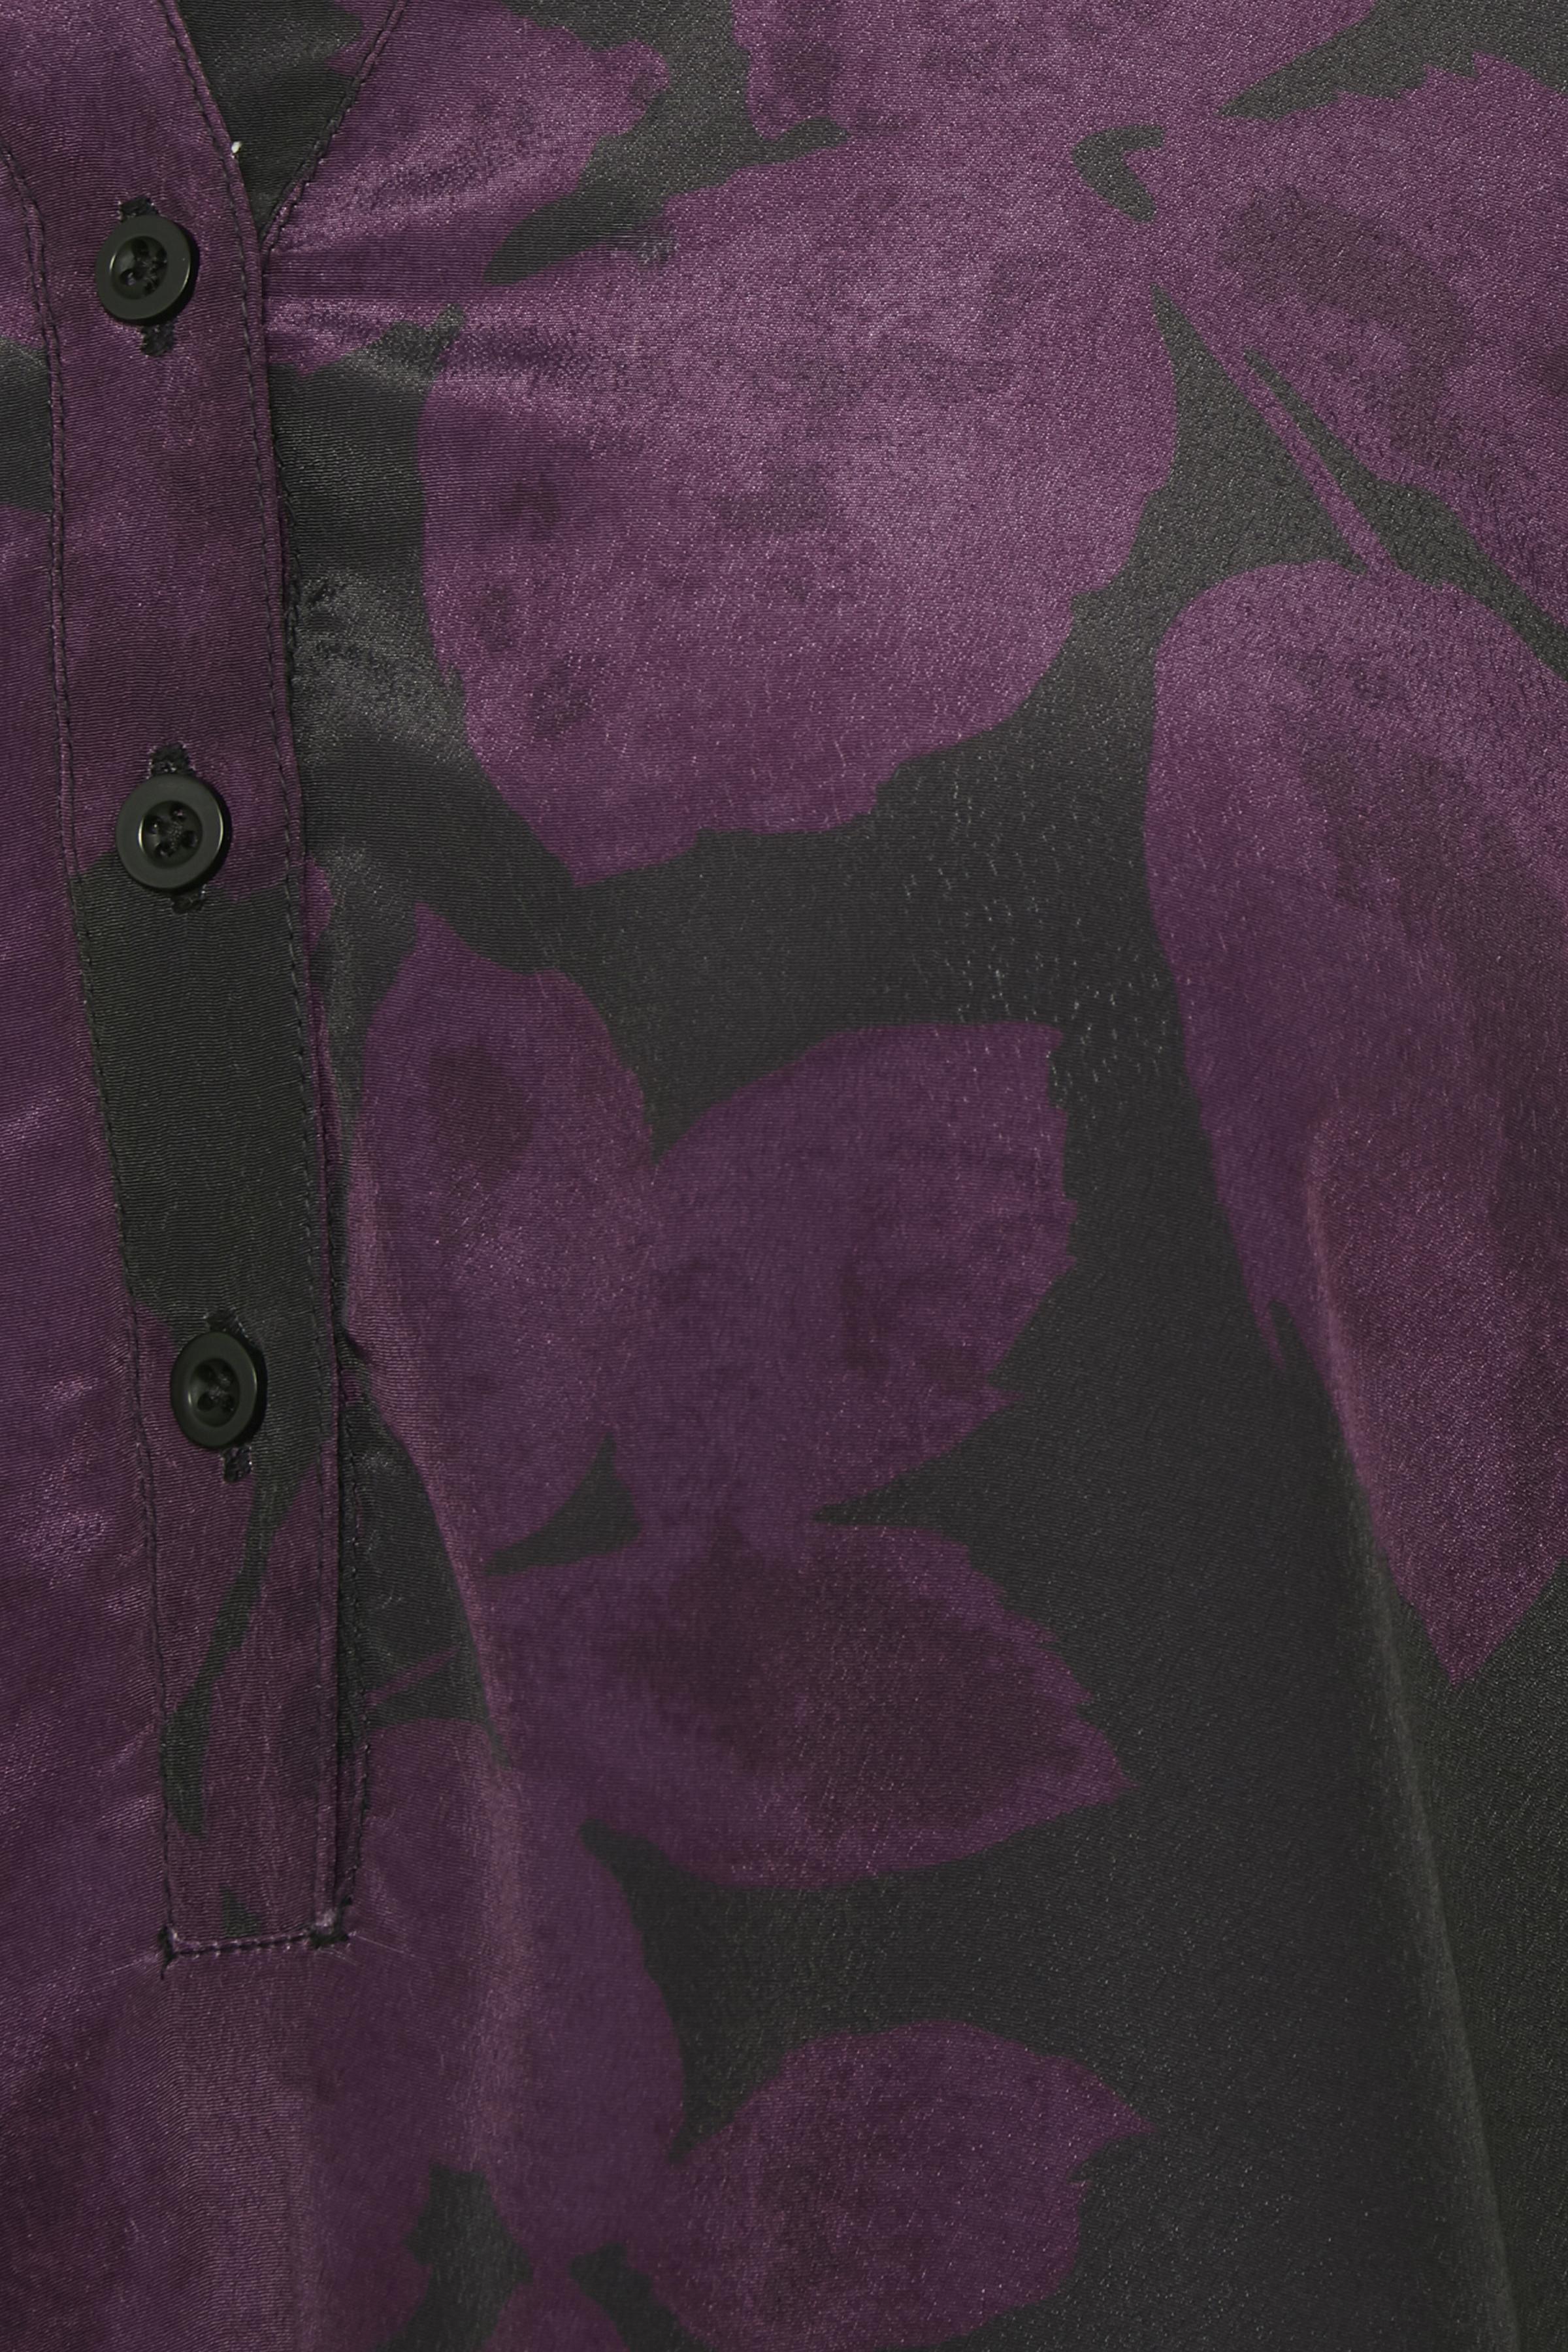 Aubergine/svart Långärmad blus från Bon'A Parte – Köp Aubergine/svart Långärmad blus från stl. S-2XL här